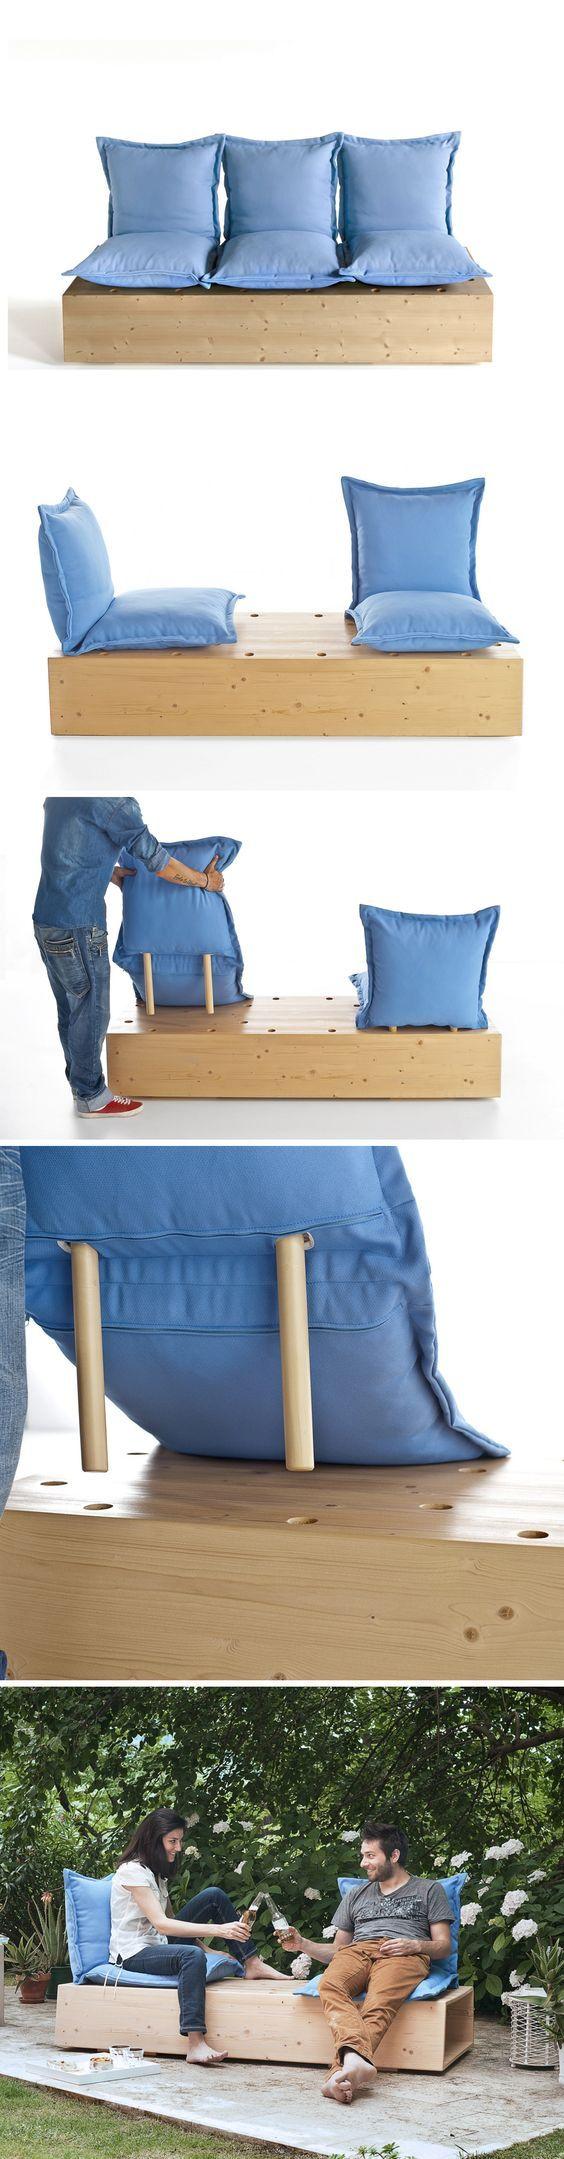 Poderia virar cama e sofá de sala. Fácil de fazer. Originalmente (Sectional garden sofa Facile by @formabilio | design Marco Gregori #design #outdoor #sofa):